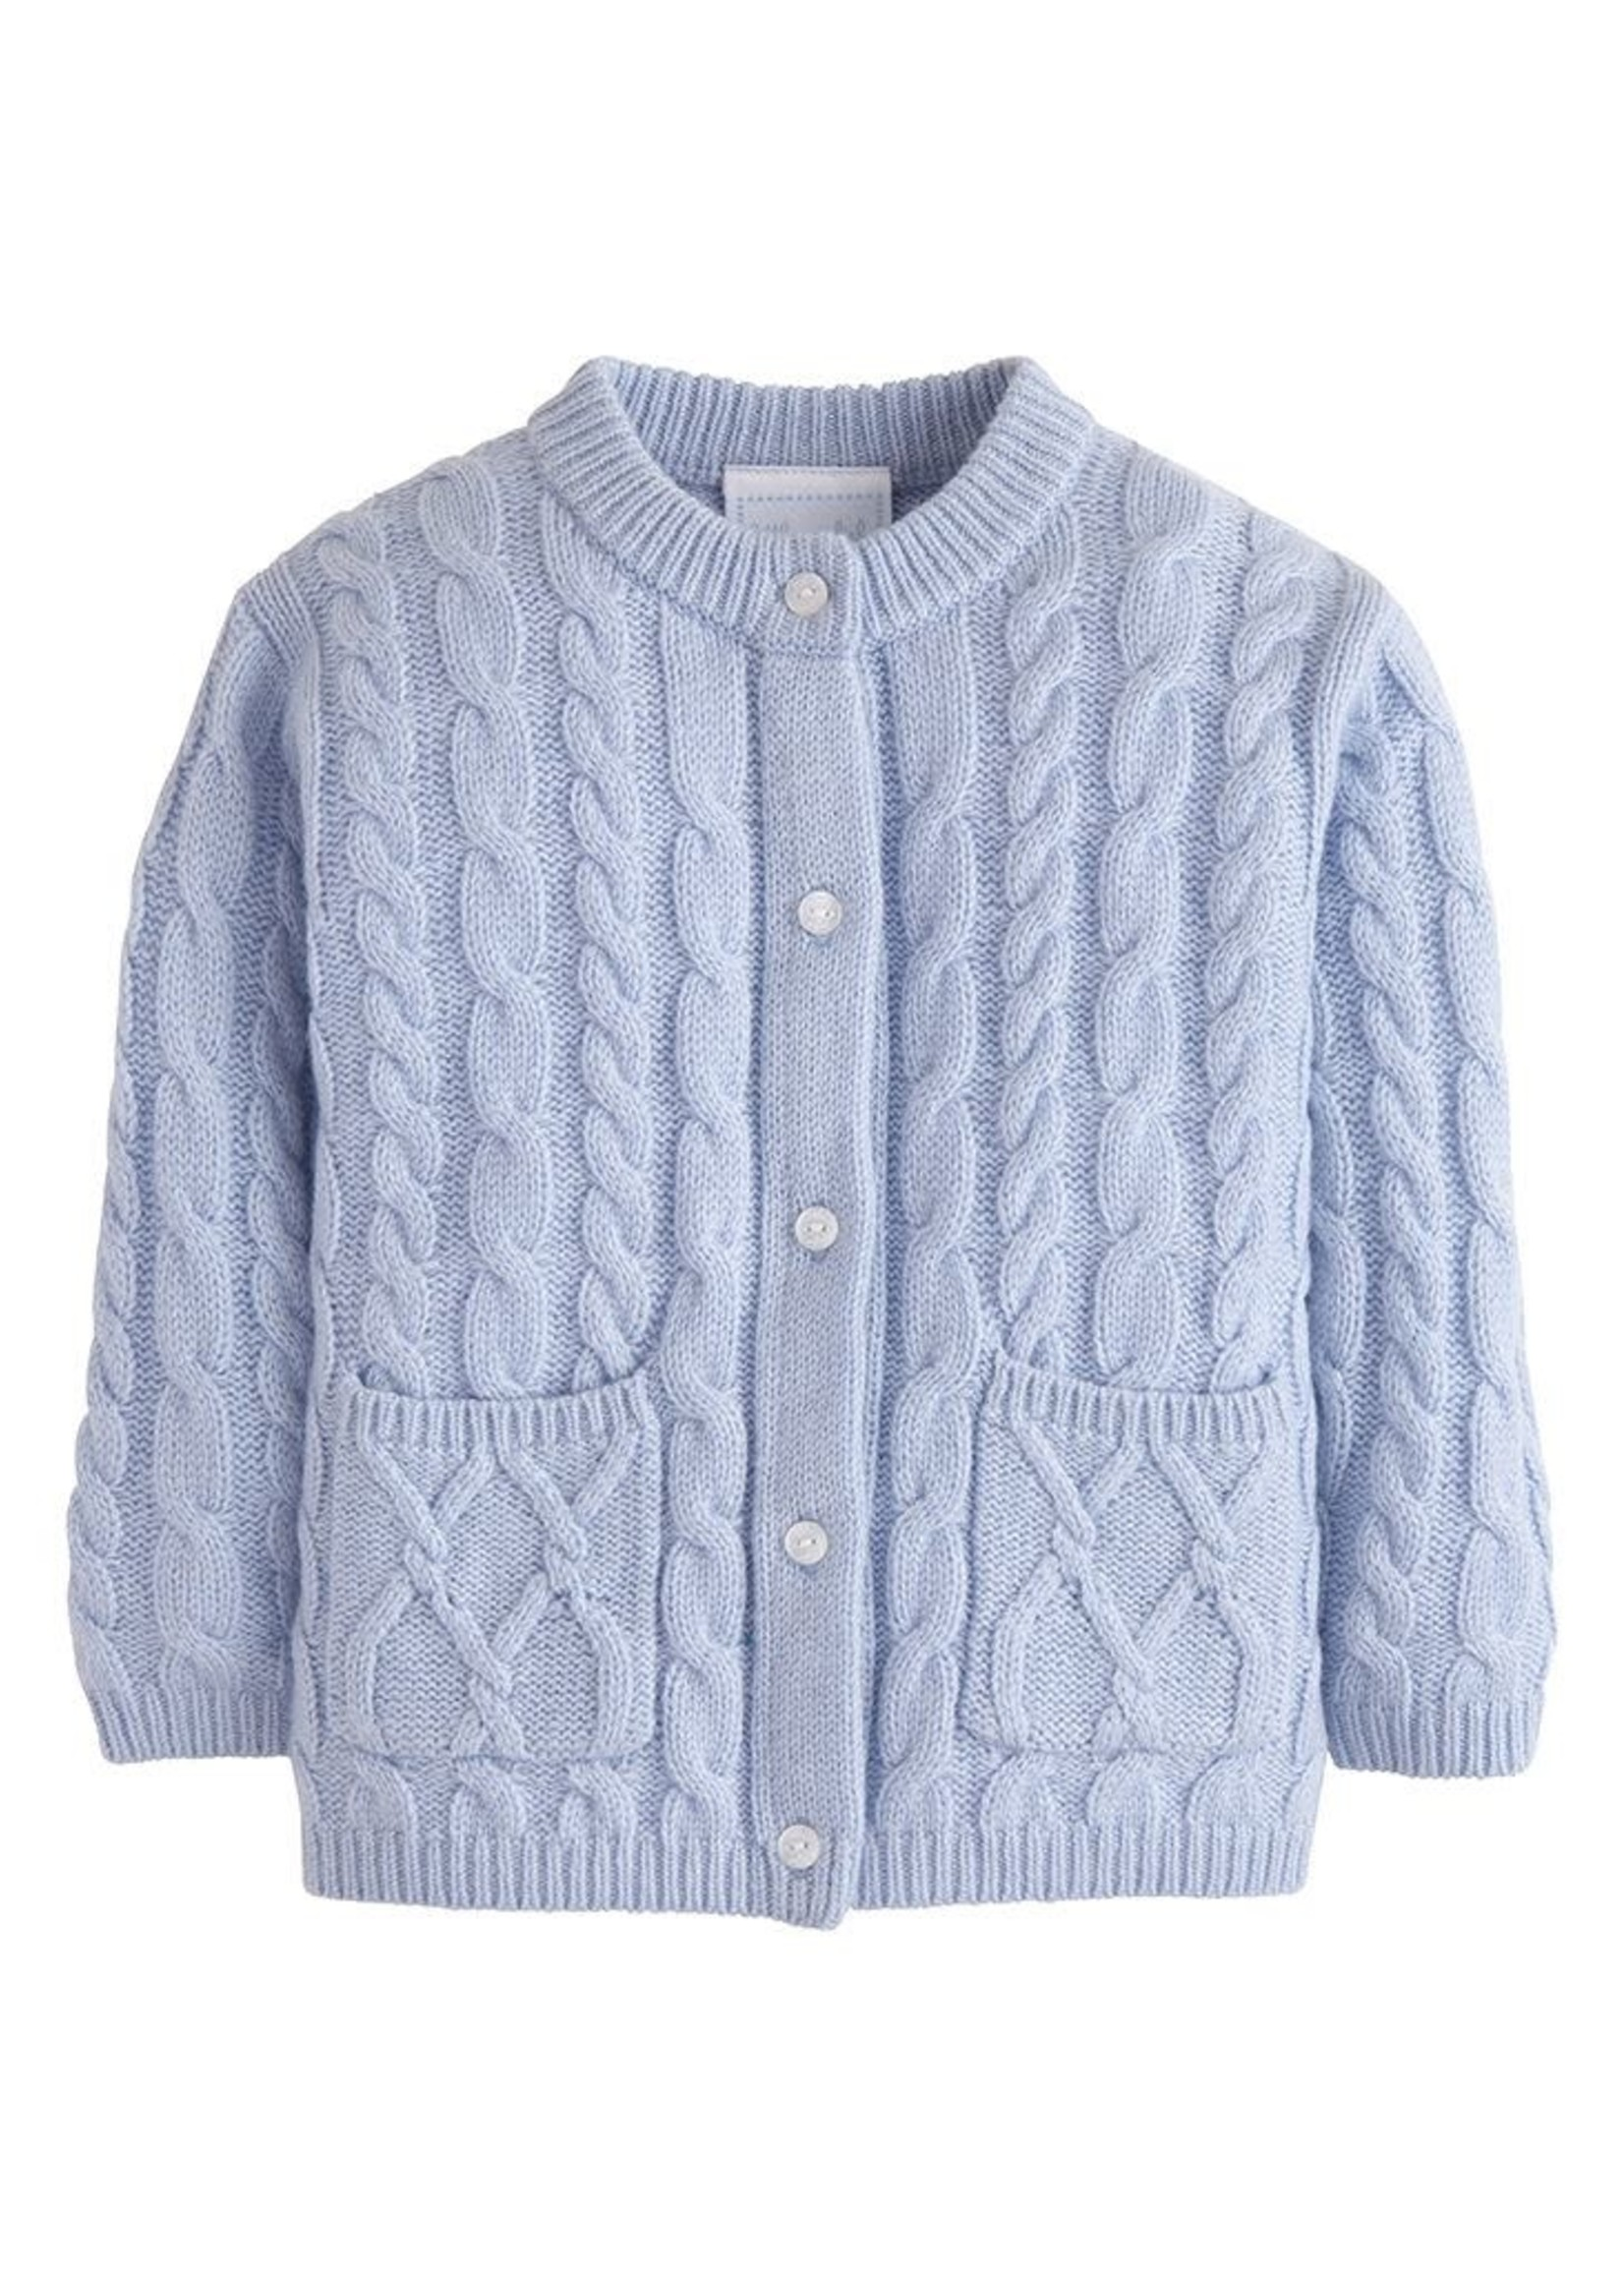 Little English Light Blue Cashmere Cardigan